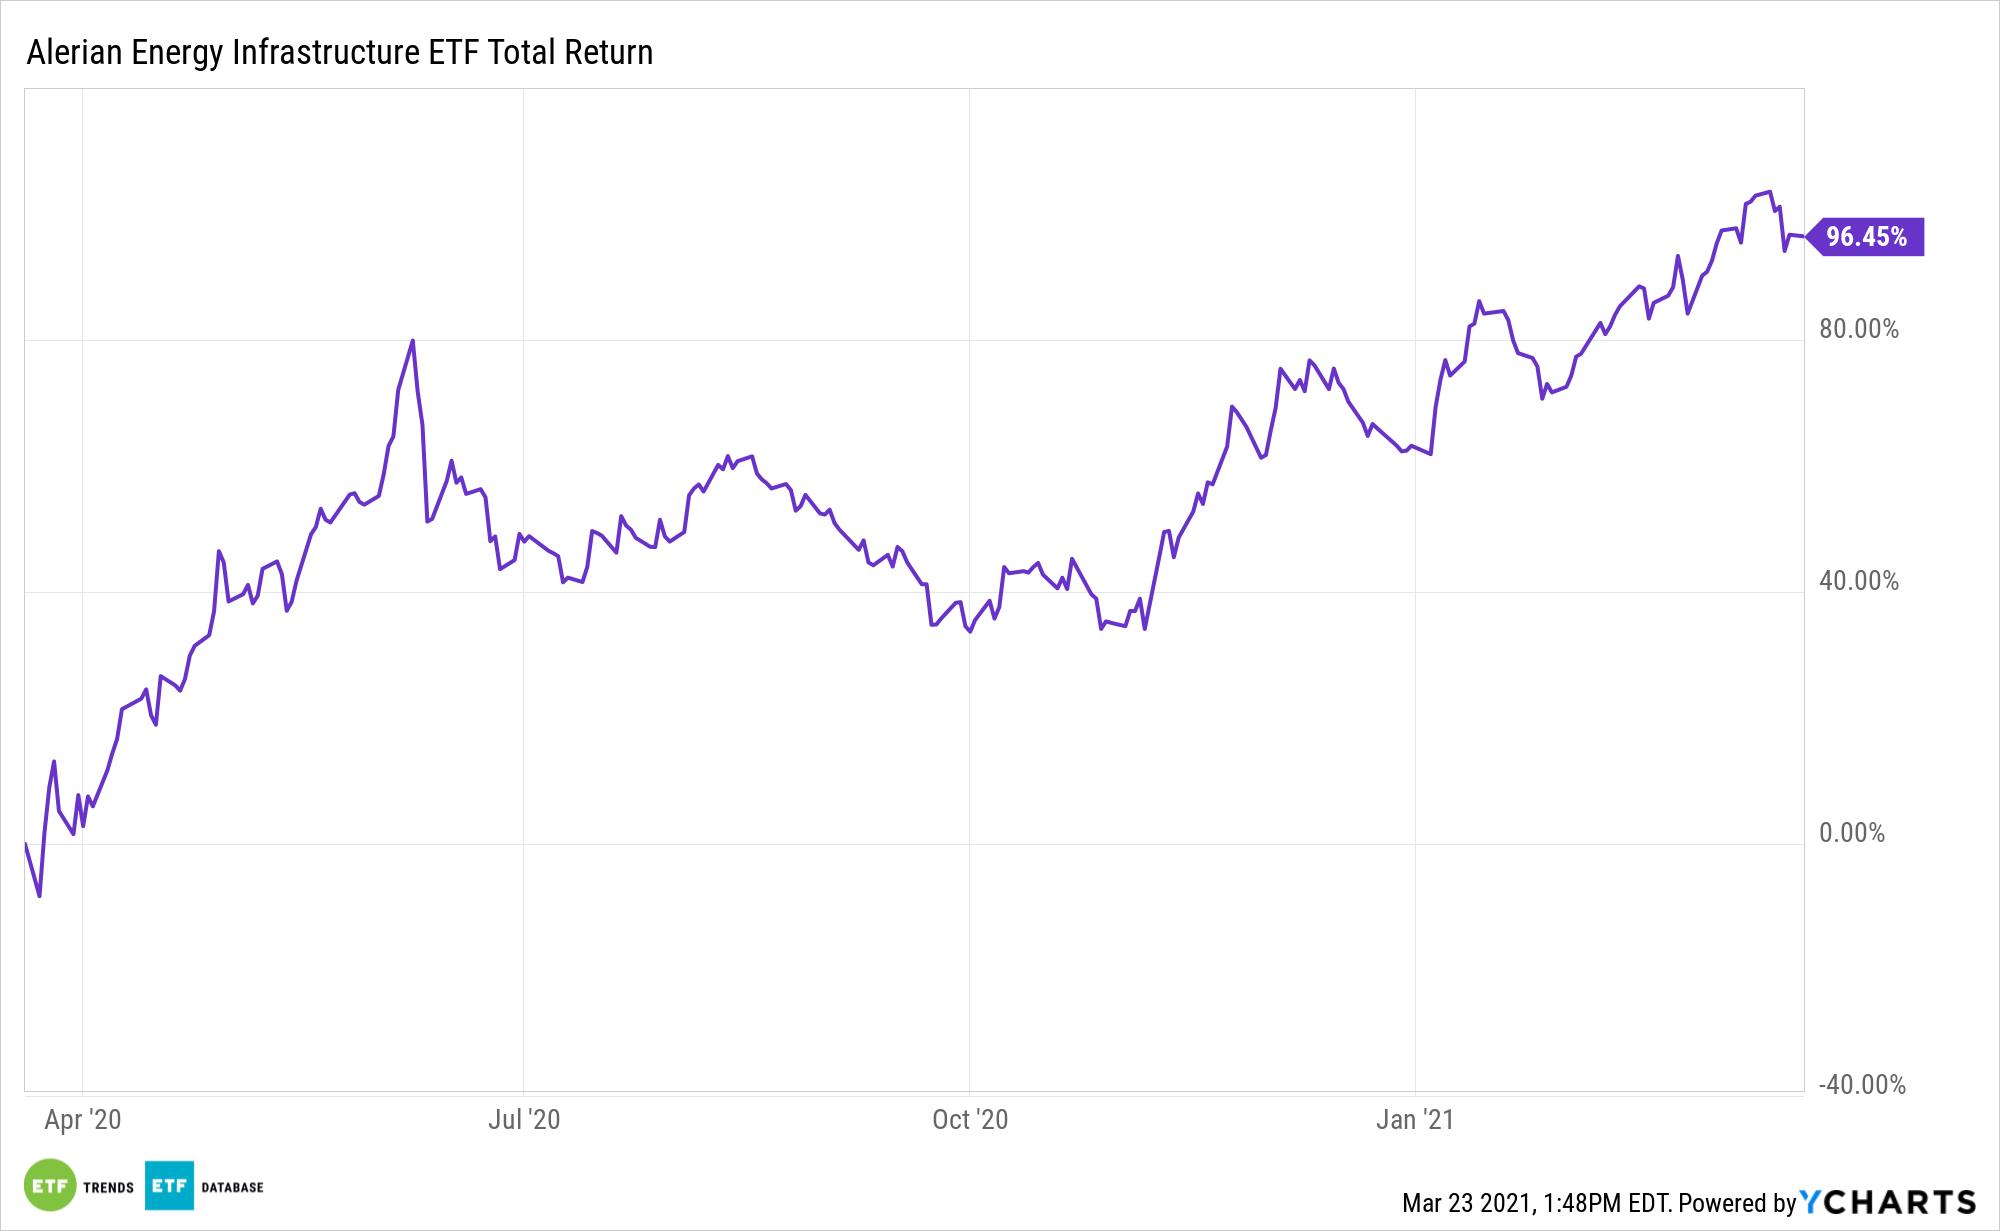 ENFR 1 Year Total Return